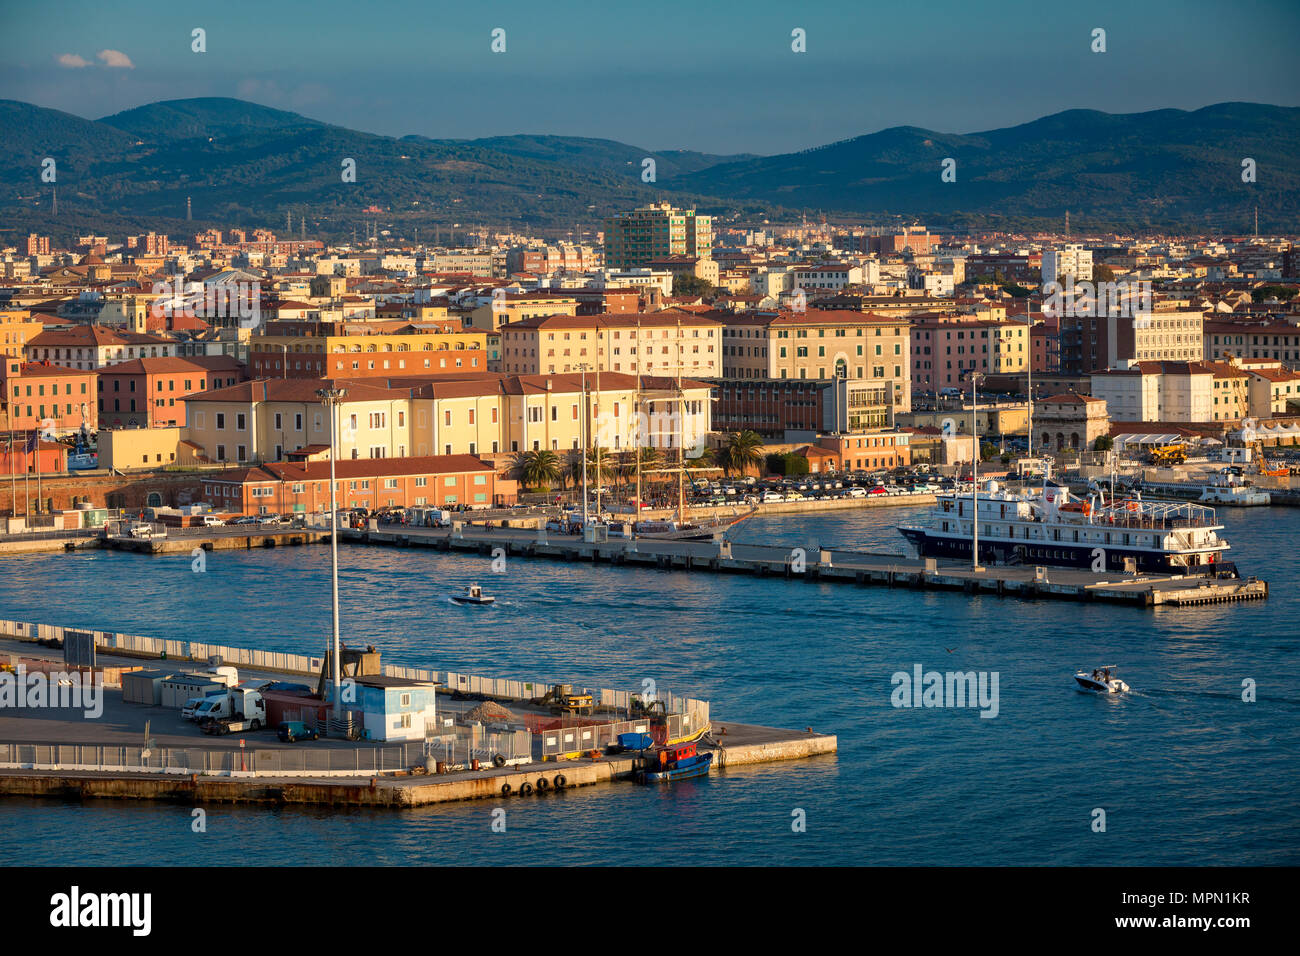 Waterfront at sunset, Livorno, Tuscany, Italy - Stock Image